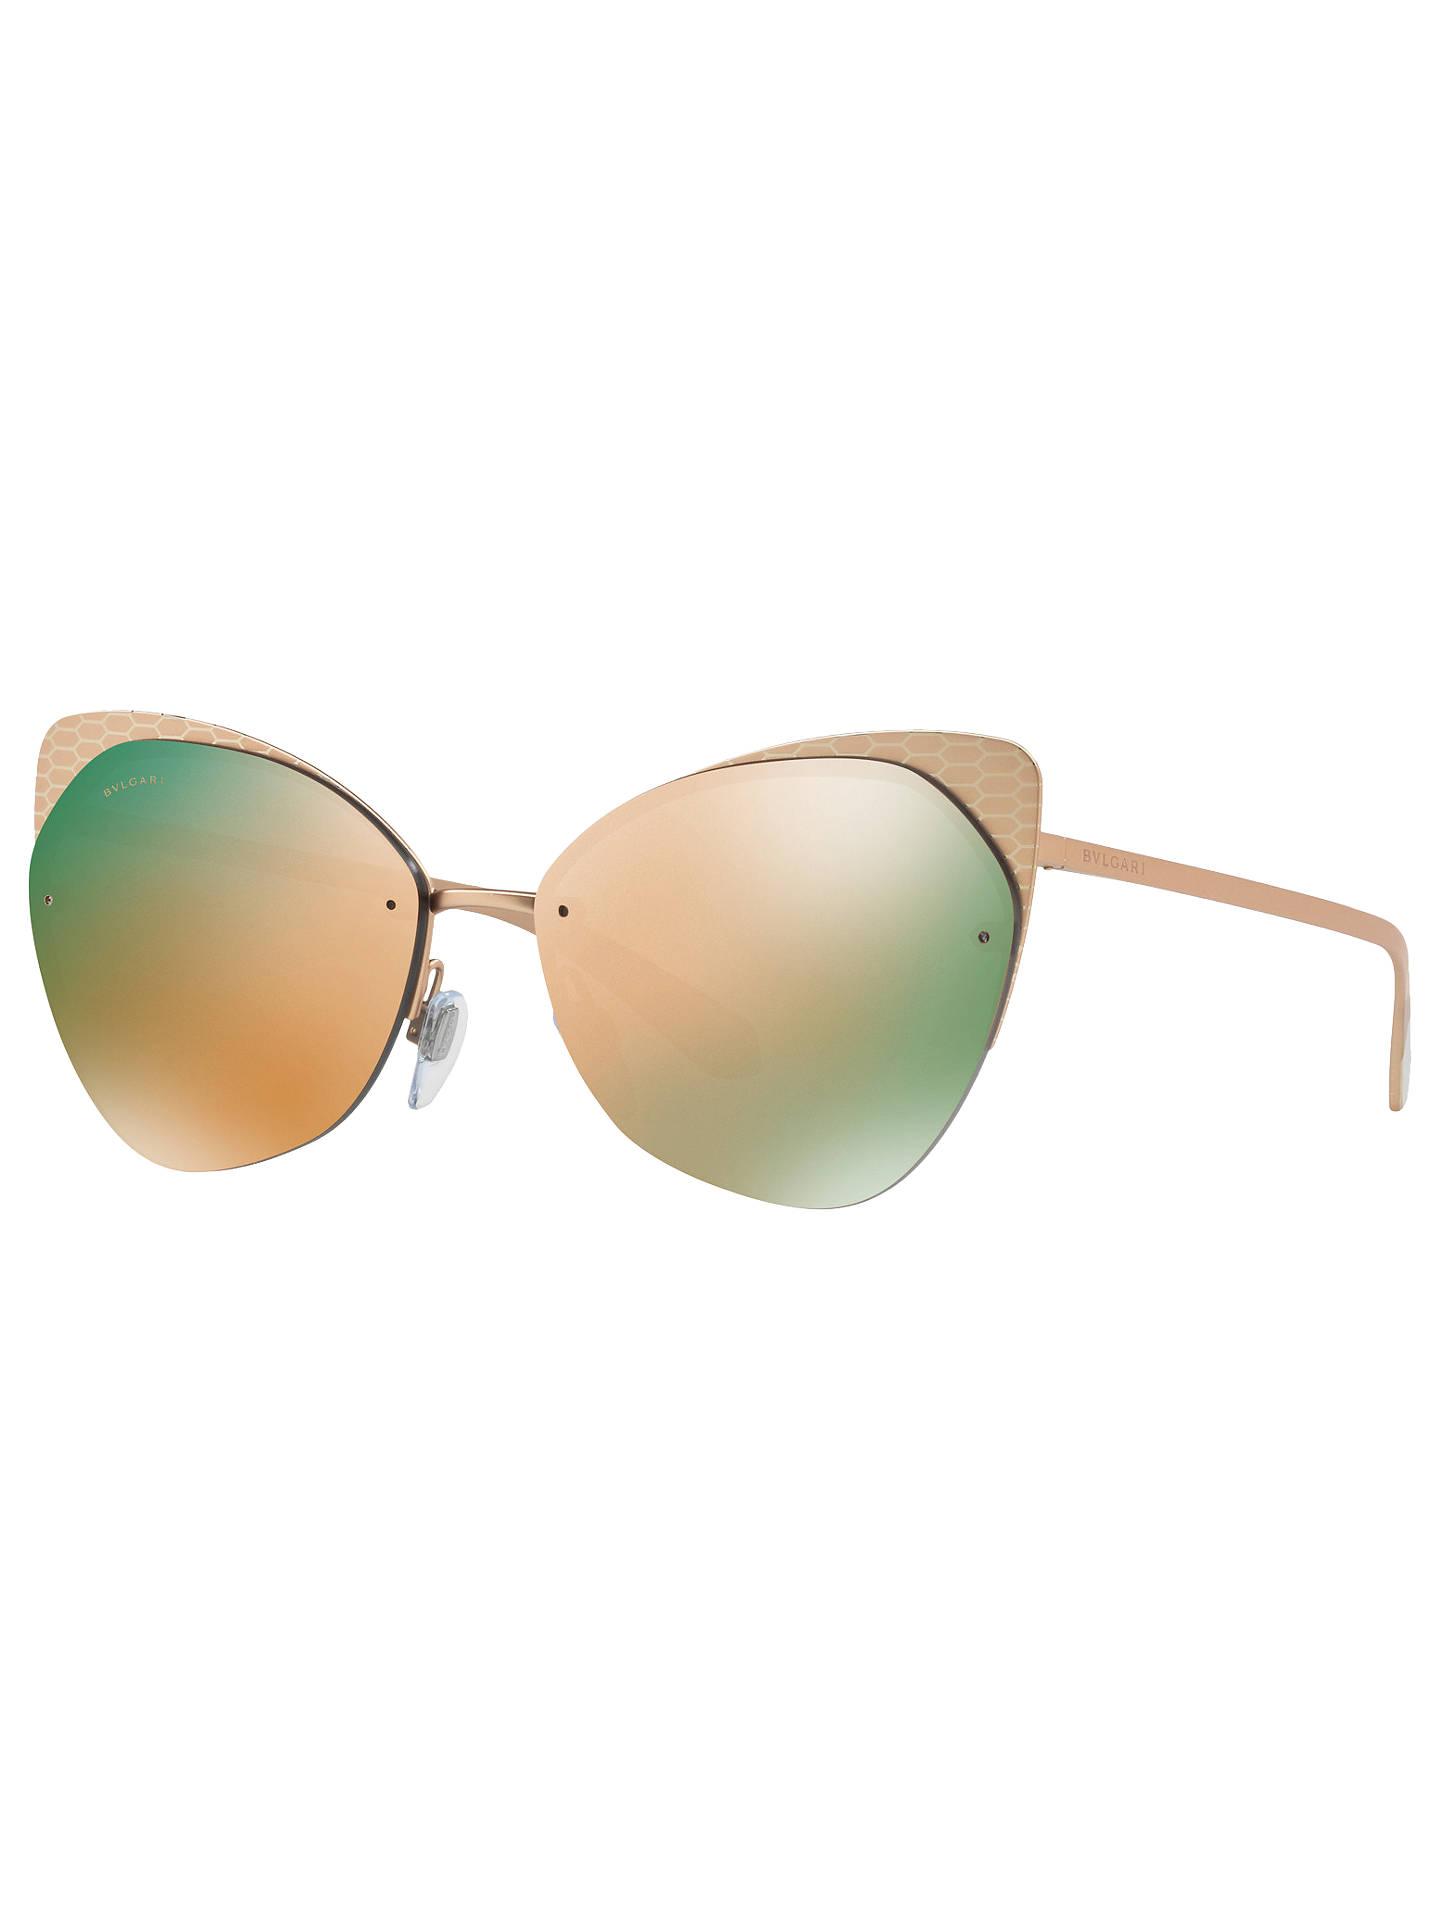 5a45d003f63 BVLGARI BV6096 Cat s Eye Sunglasses at John Lewis   Partners